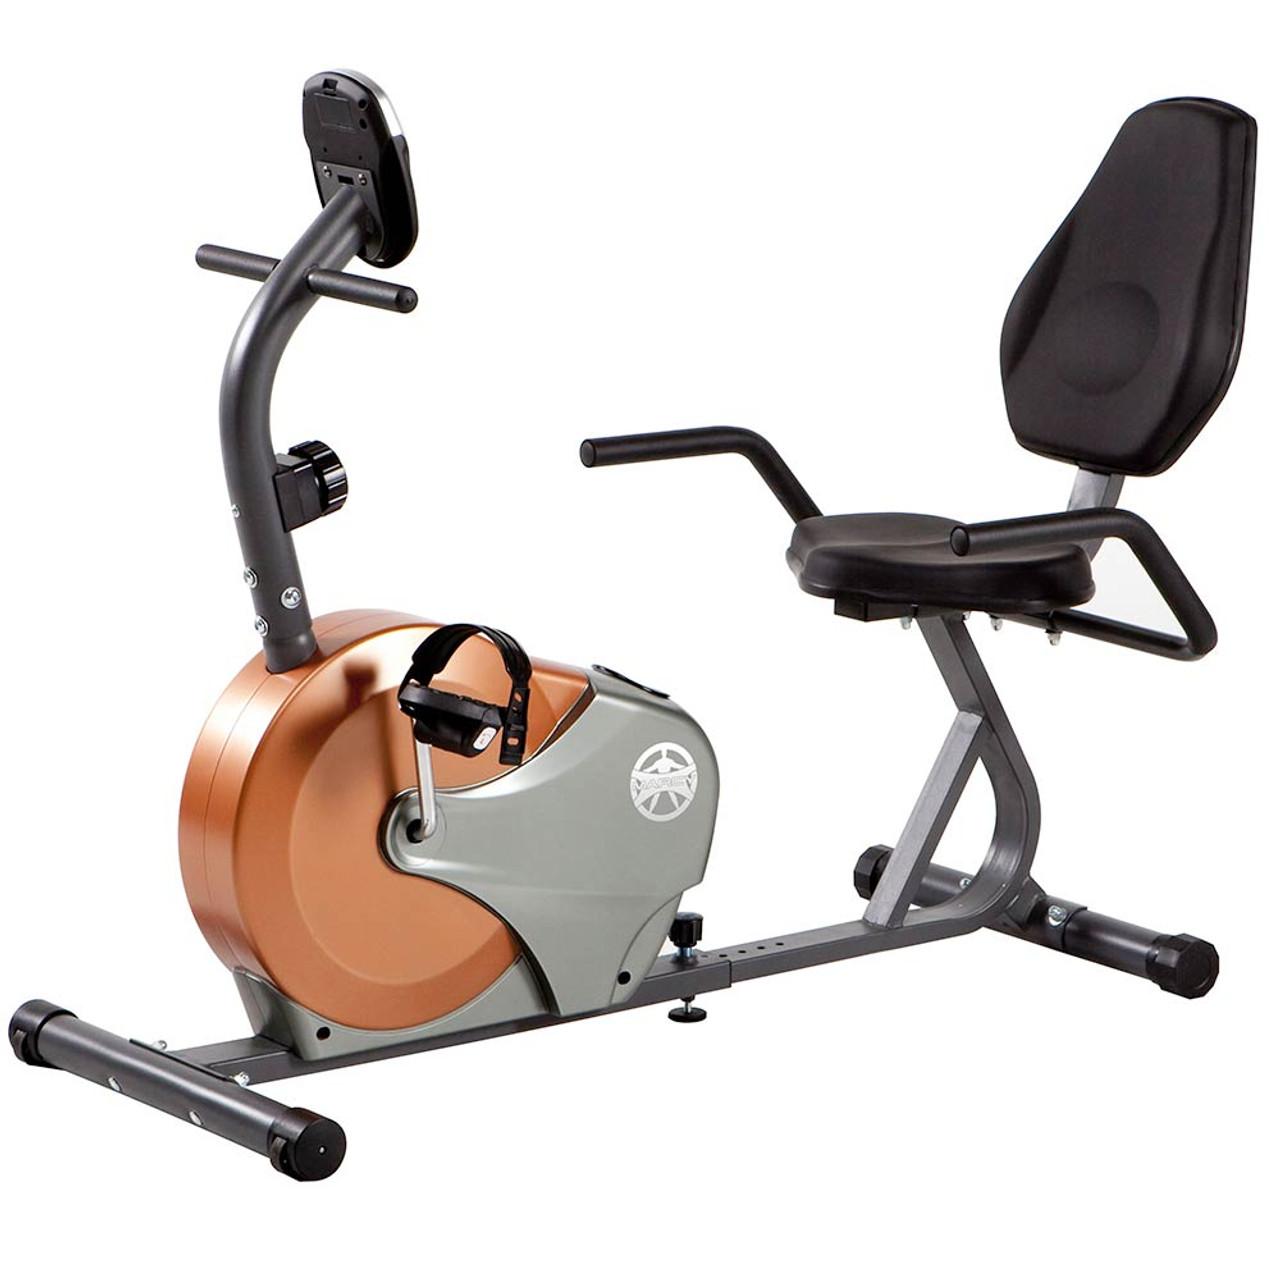 4a7b12be7ae Recumbent Exercise Bike